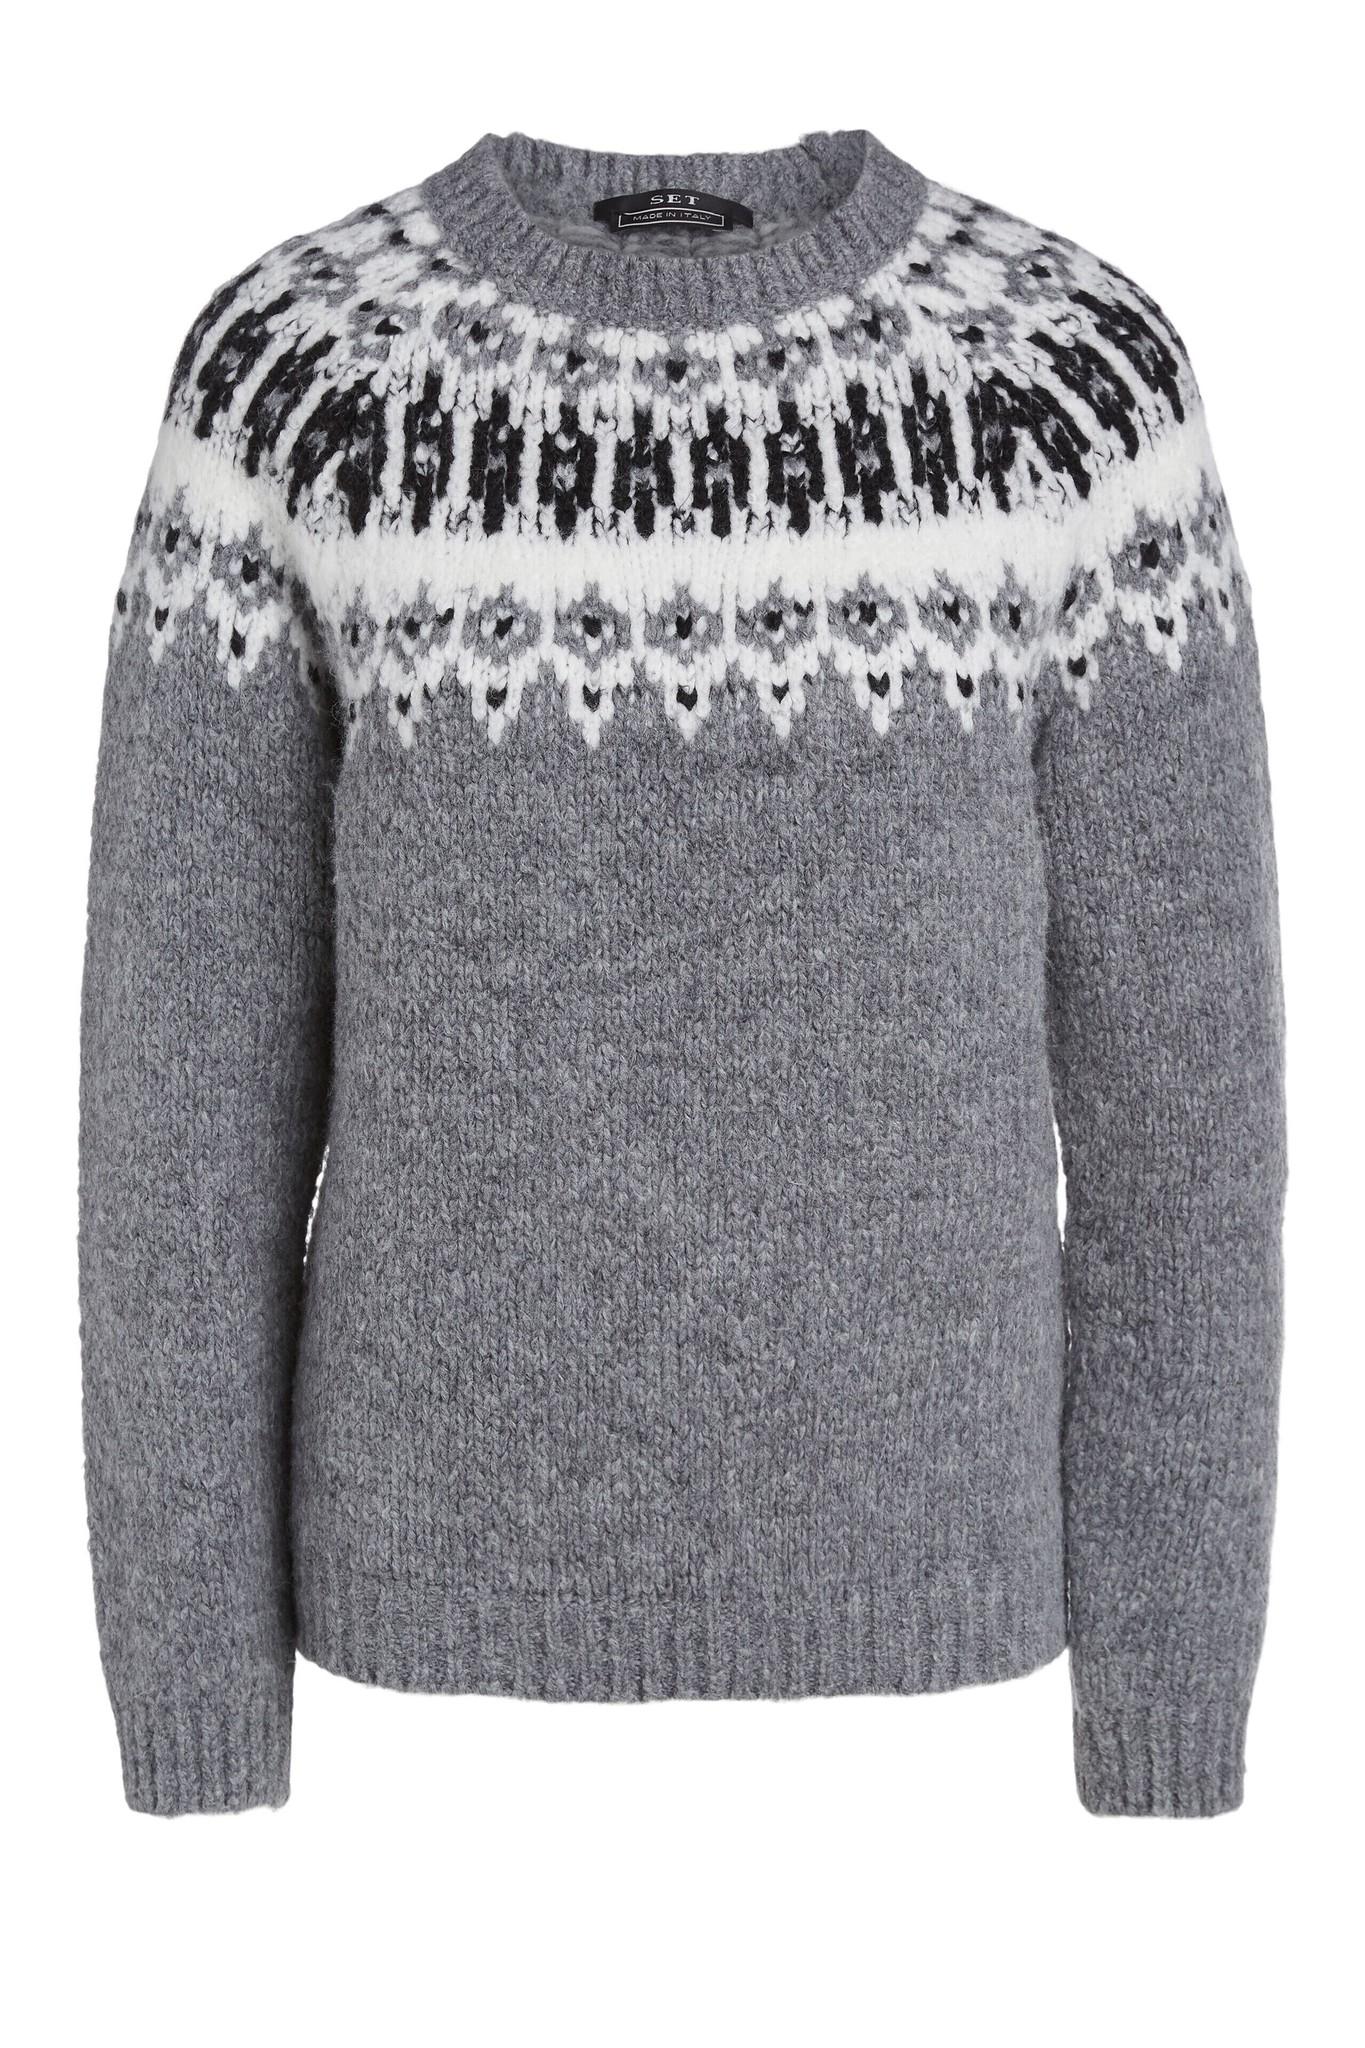 SET pullover 74031 0901-1